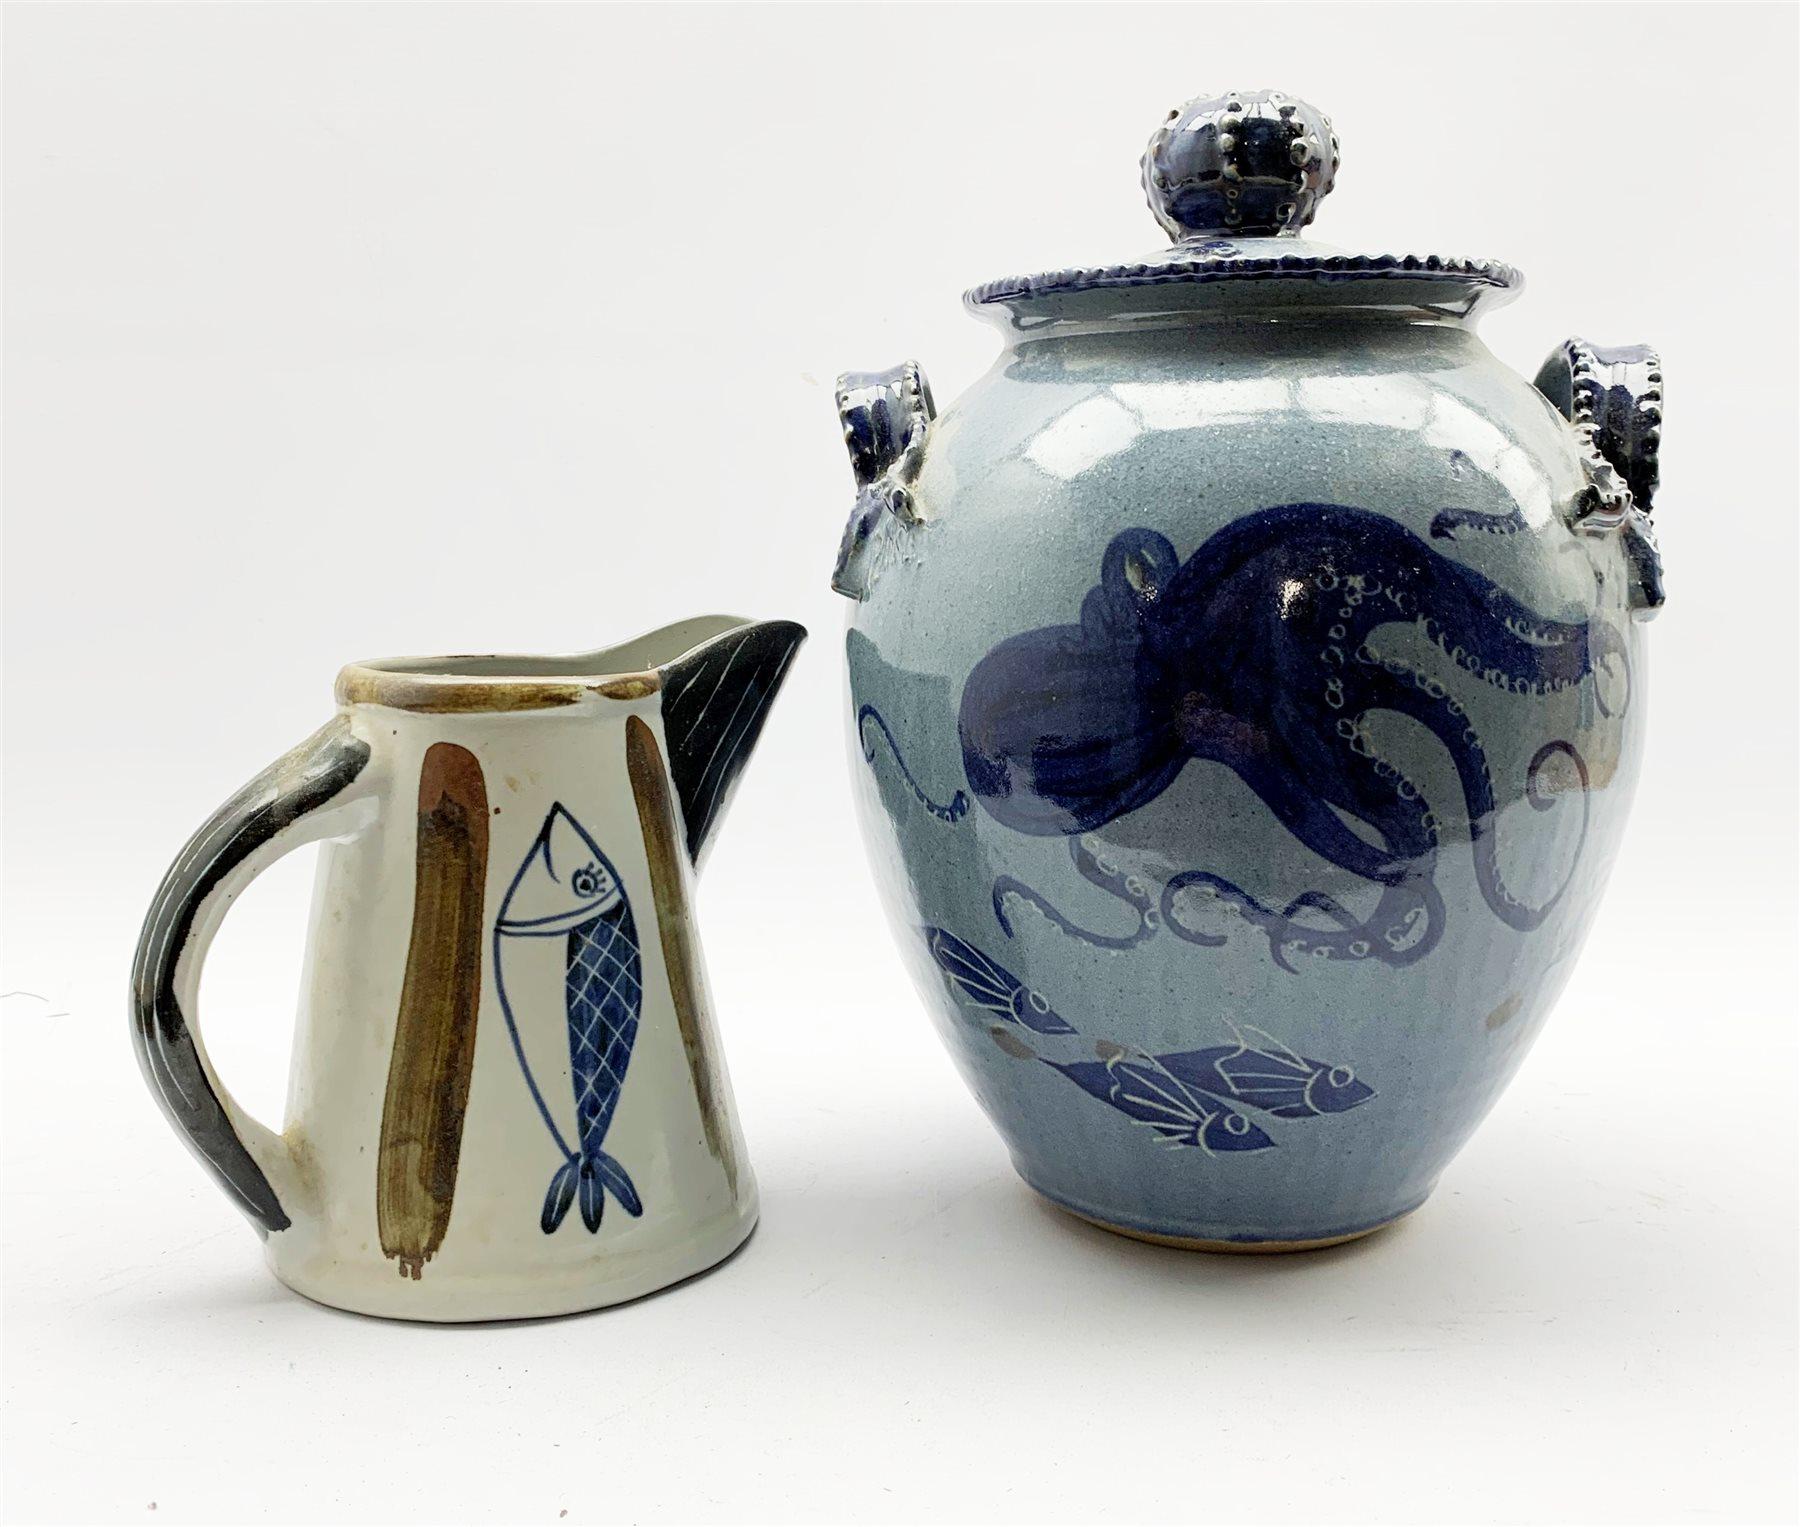 Studio pottery lidded vase in the style of Kevin Walker